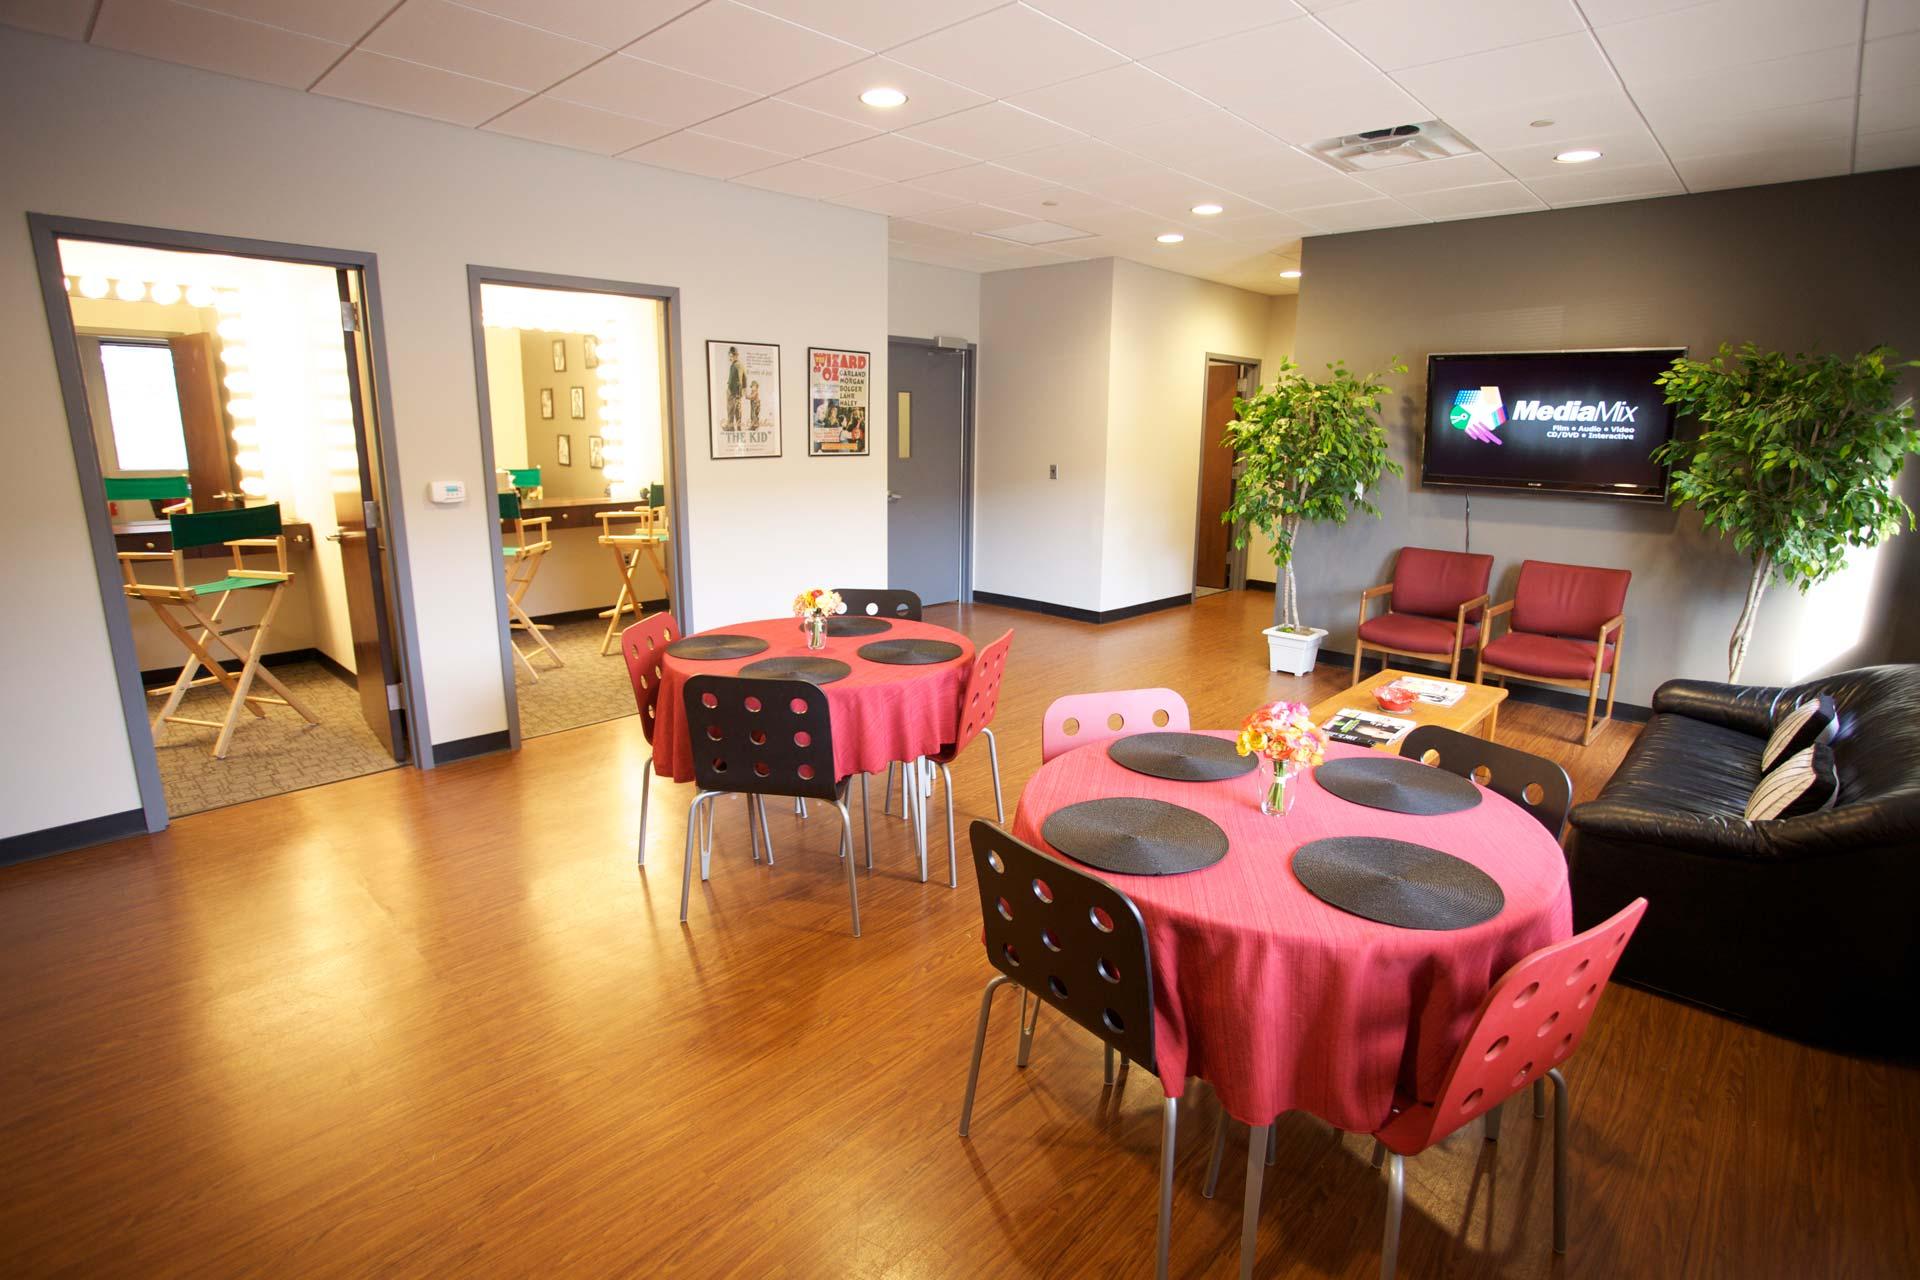 Photo of the Green Room at MediaMix Studios